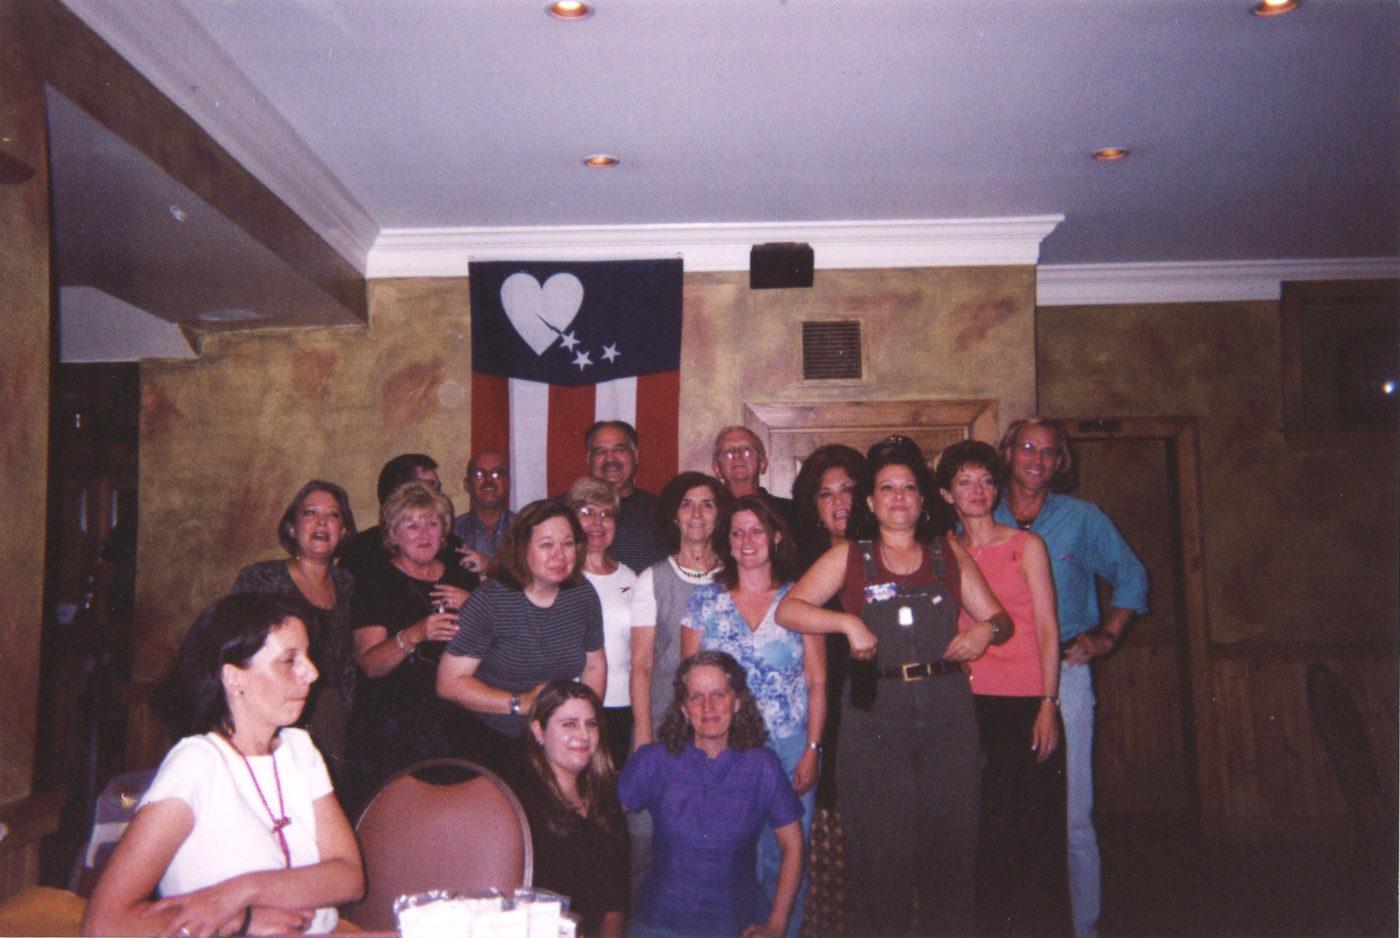 Lenore Mills- Ground Zero Fellowship Fathers September 7, 2002